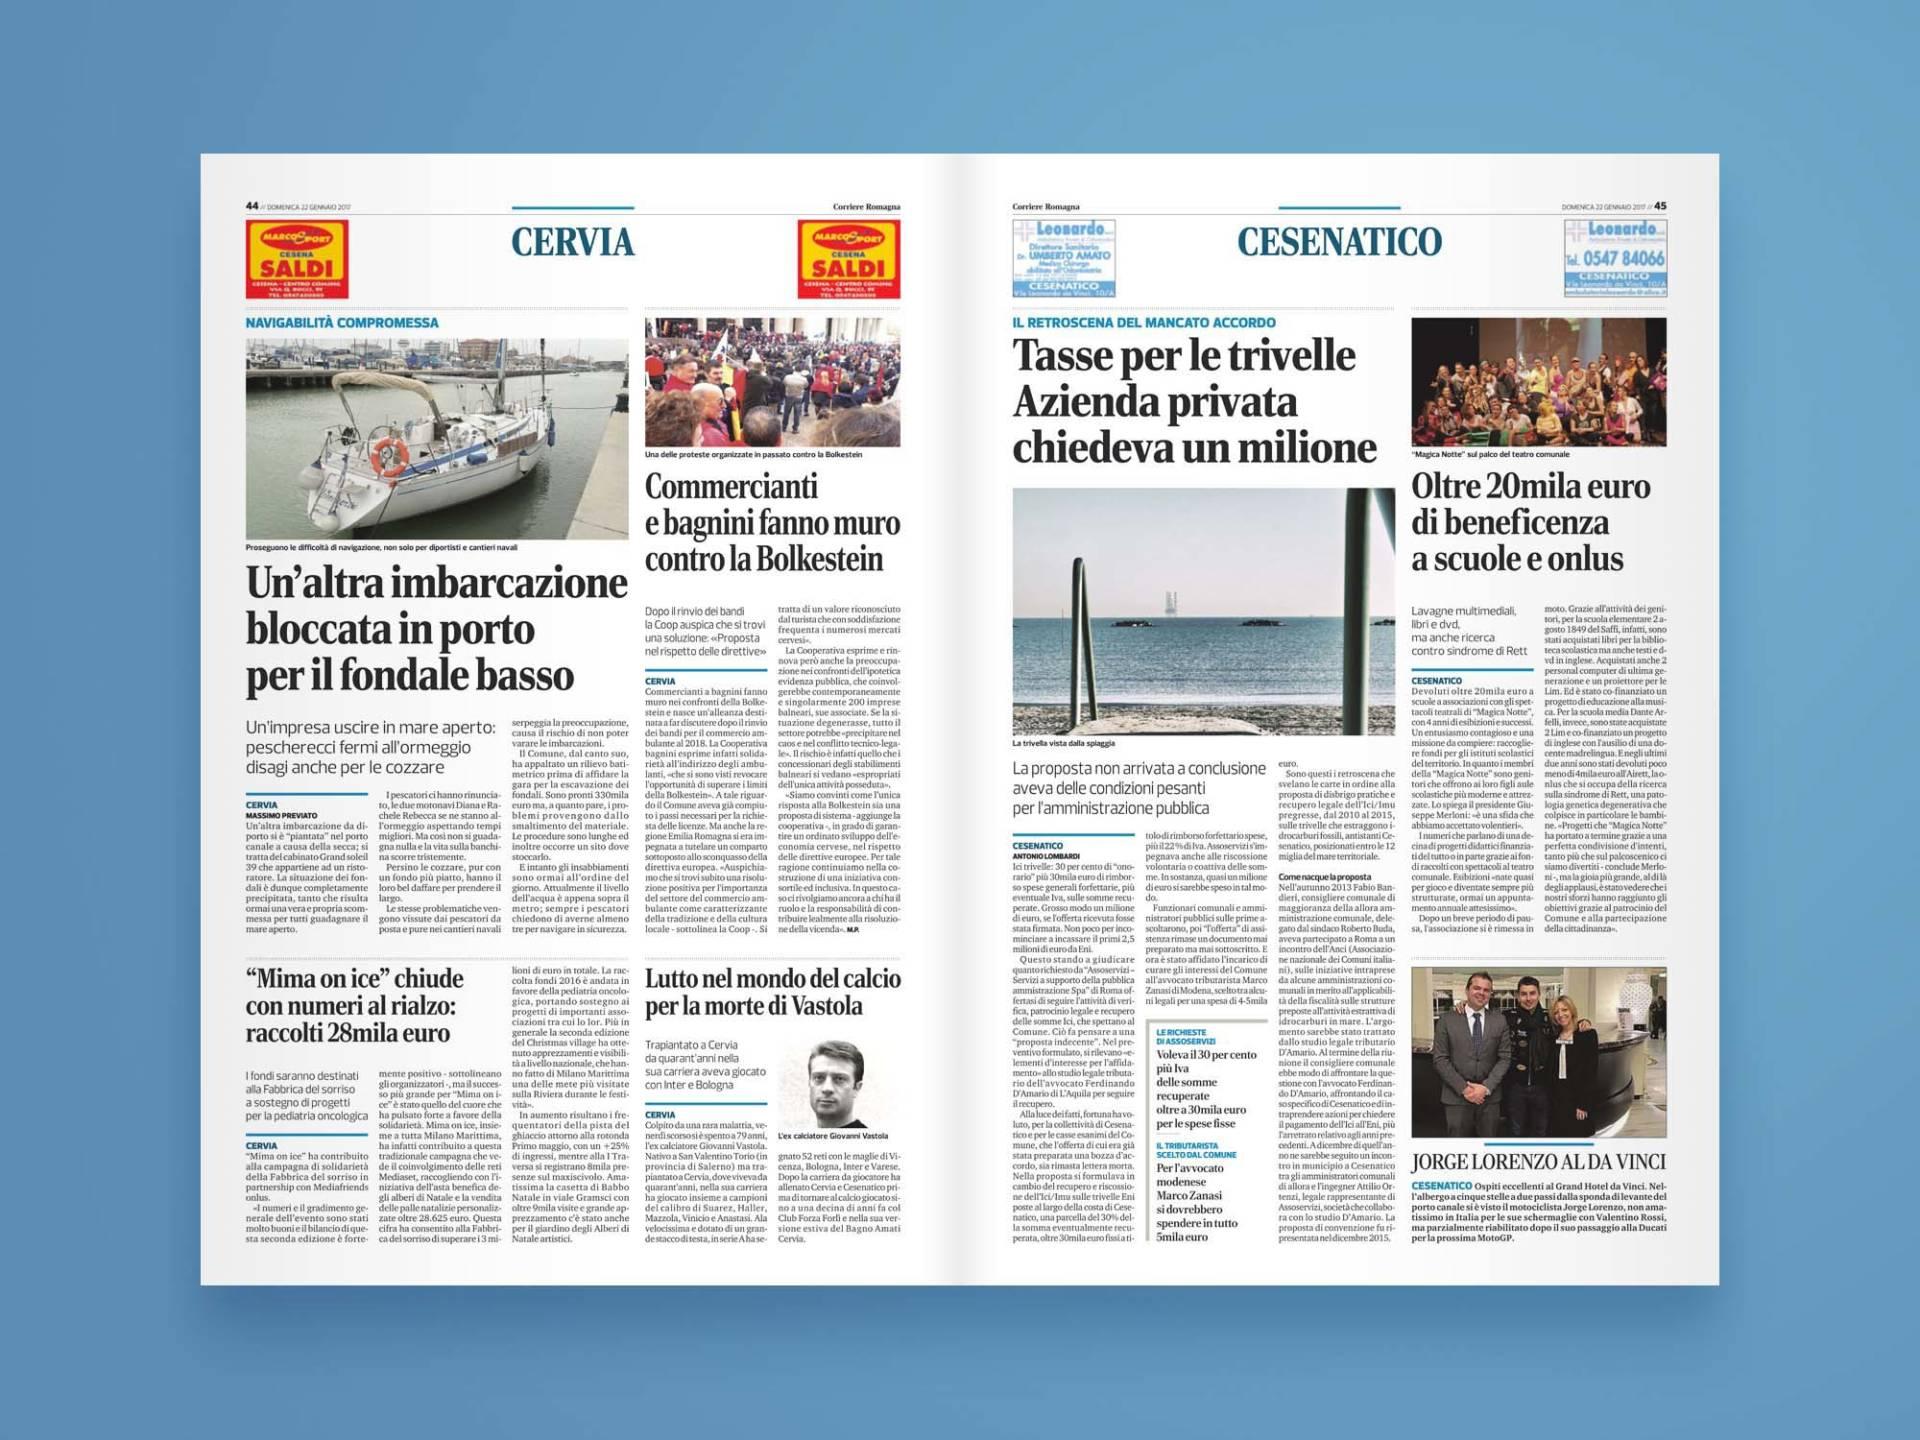 Corriere_Romagna_04_Wenceslau_News_Design